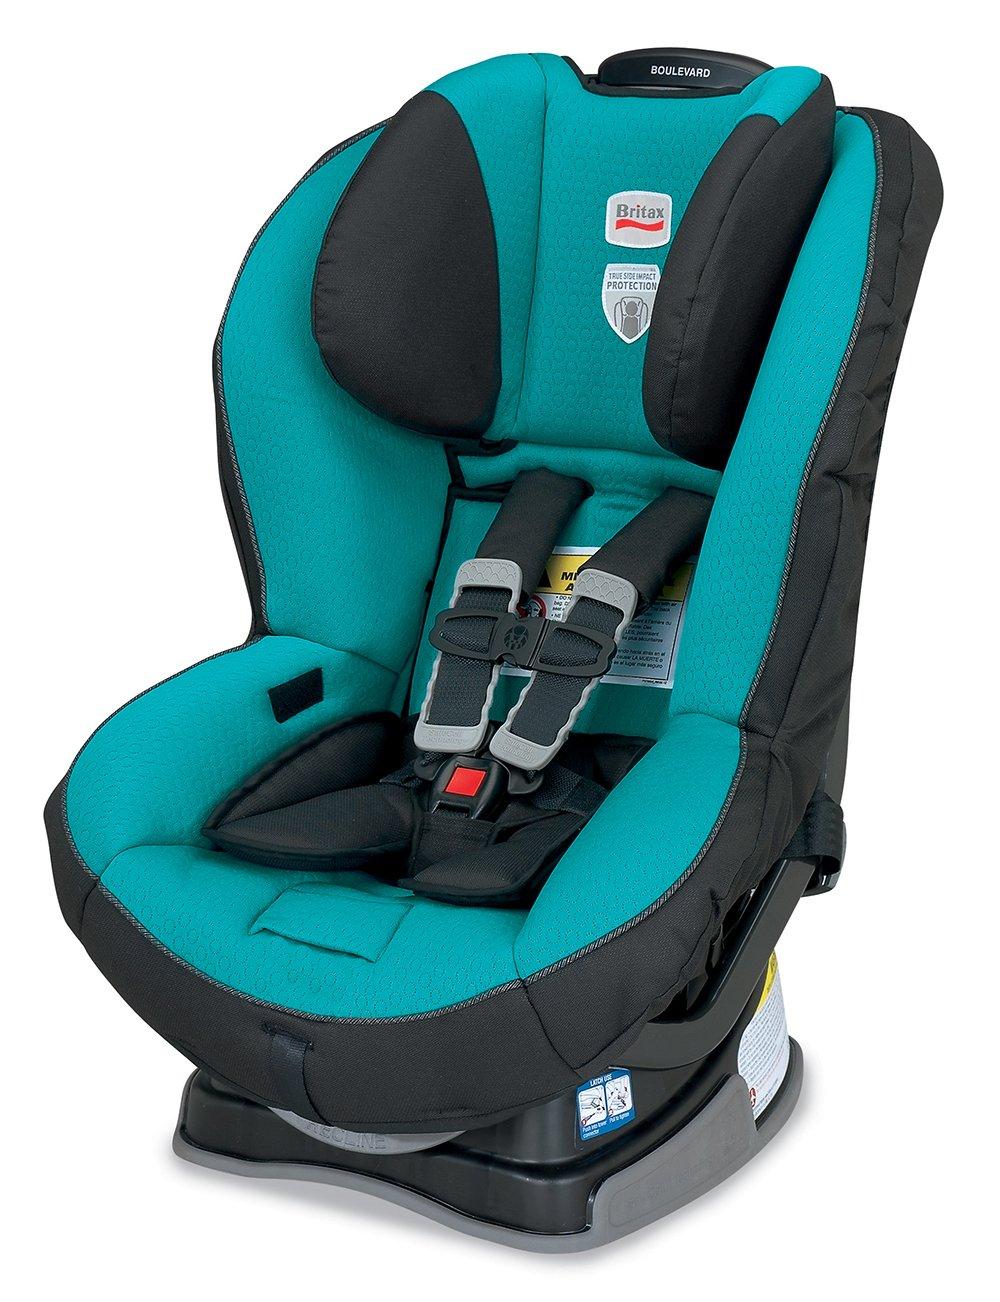 Amazon.com : Britax Boulevard G4 Convertible Car Seat, Laguna ...